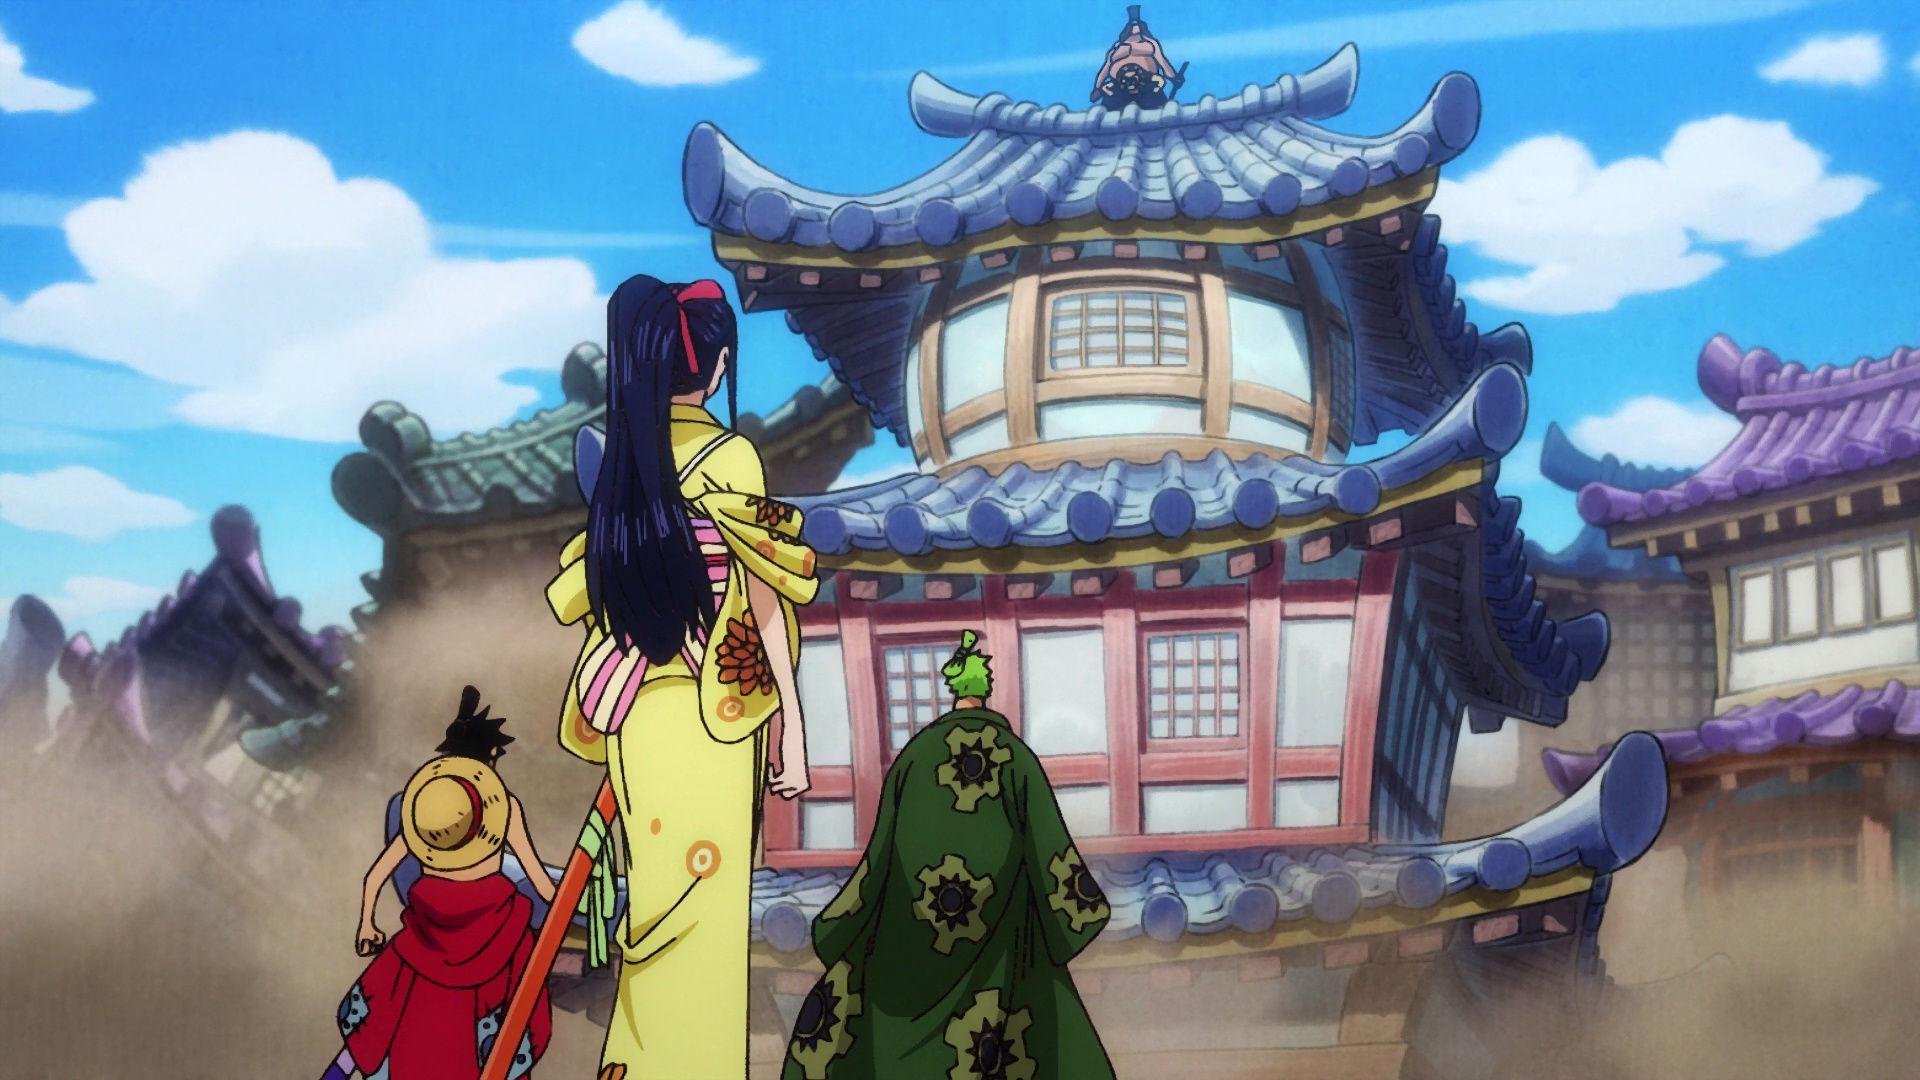 One Piece 905 VOSTFR SD/HD/HD 10BITS/FHD News background